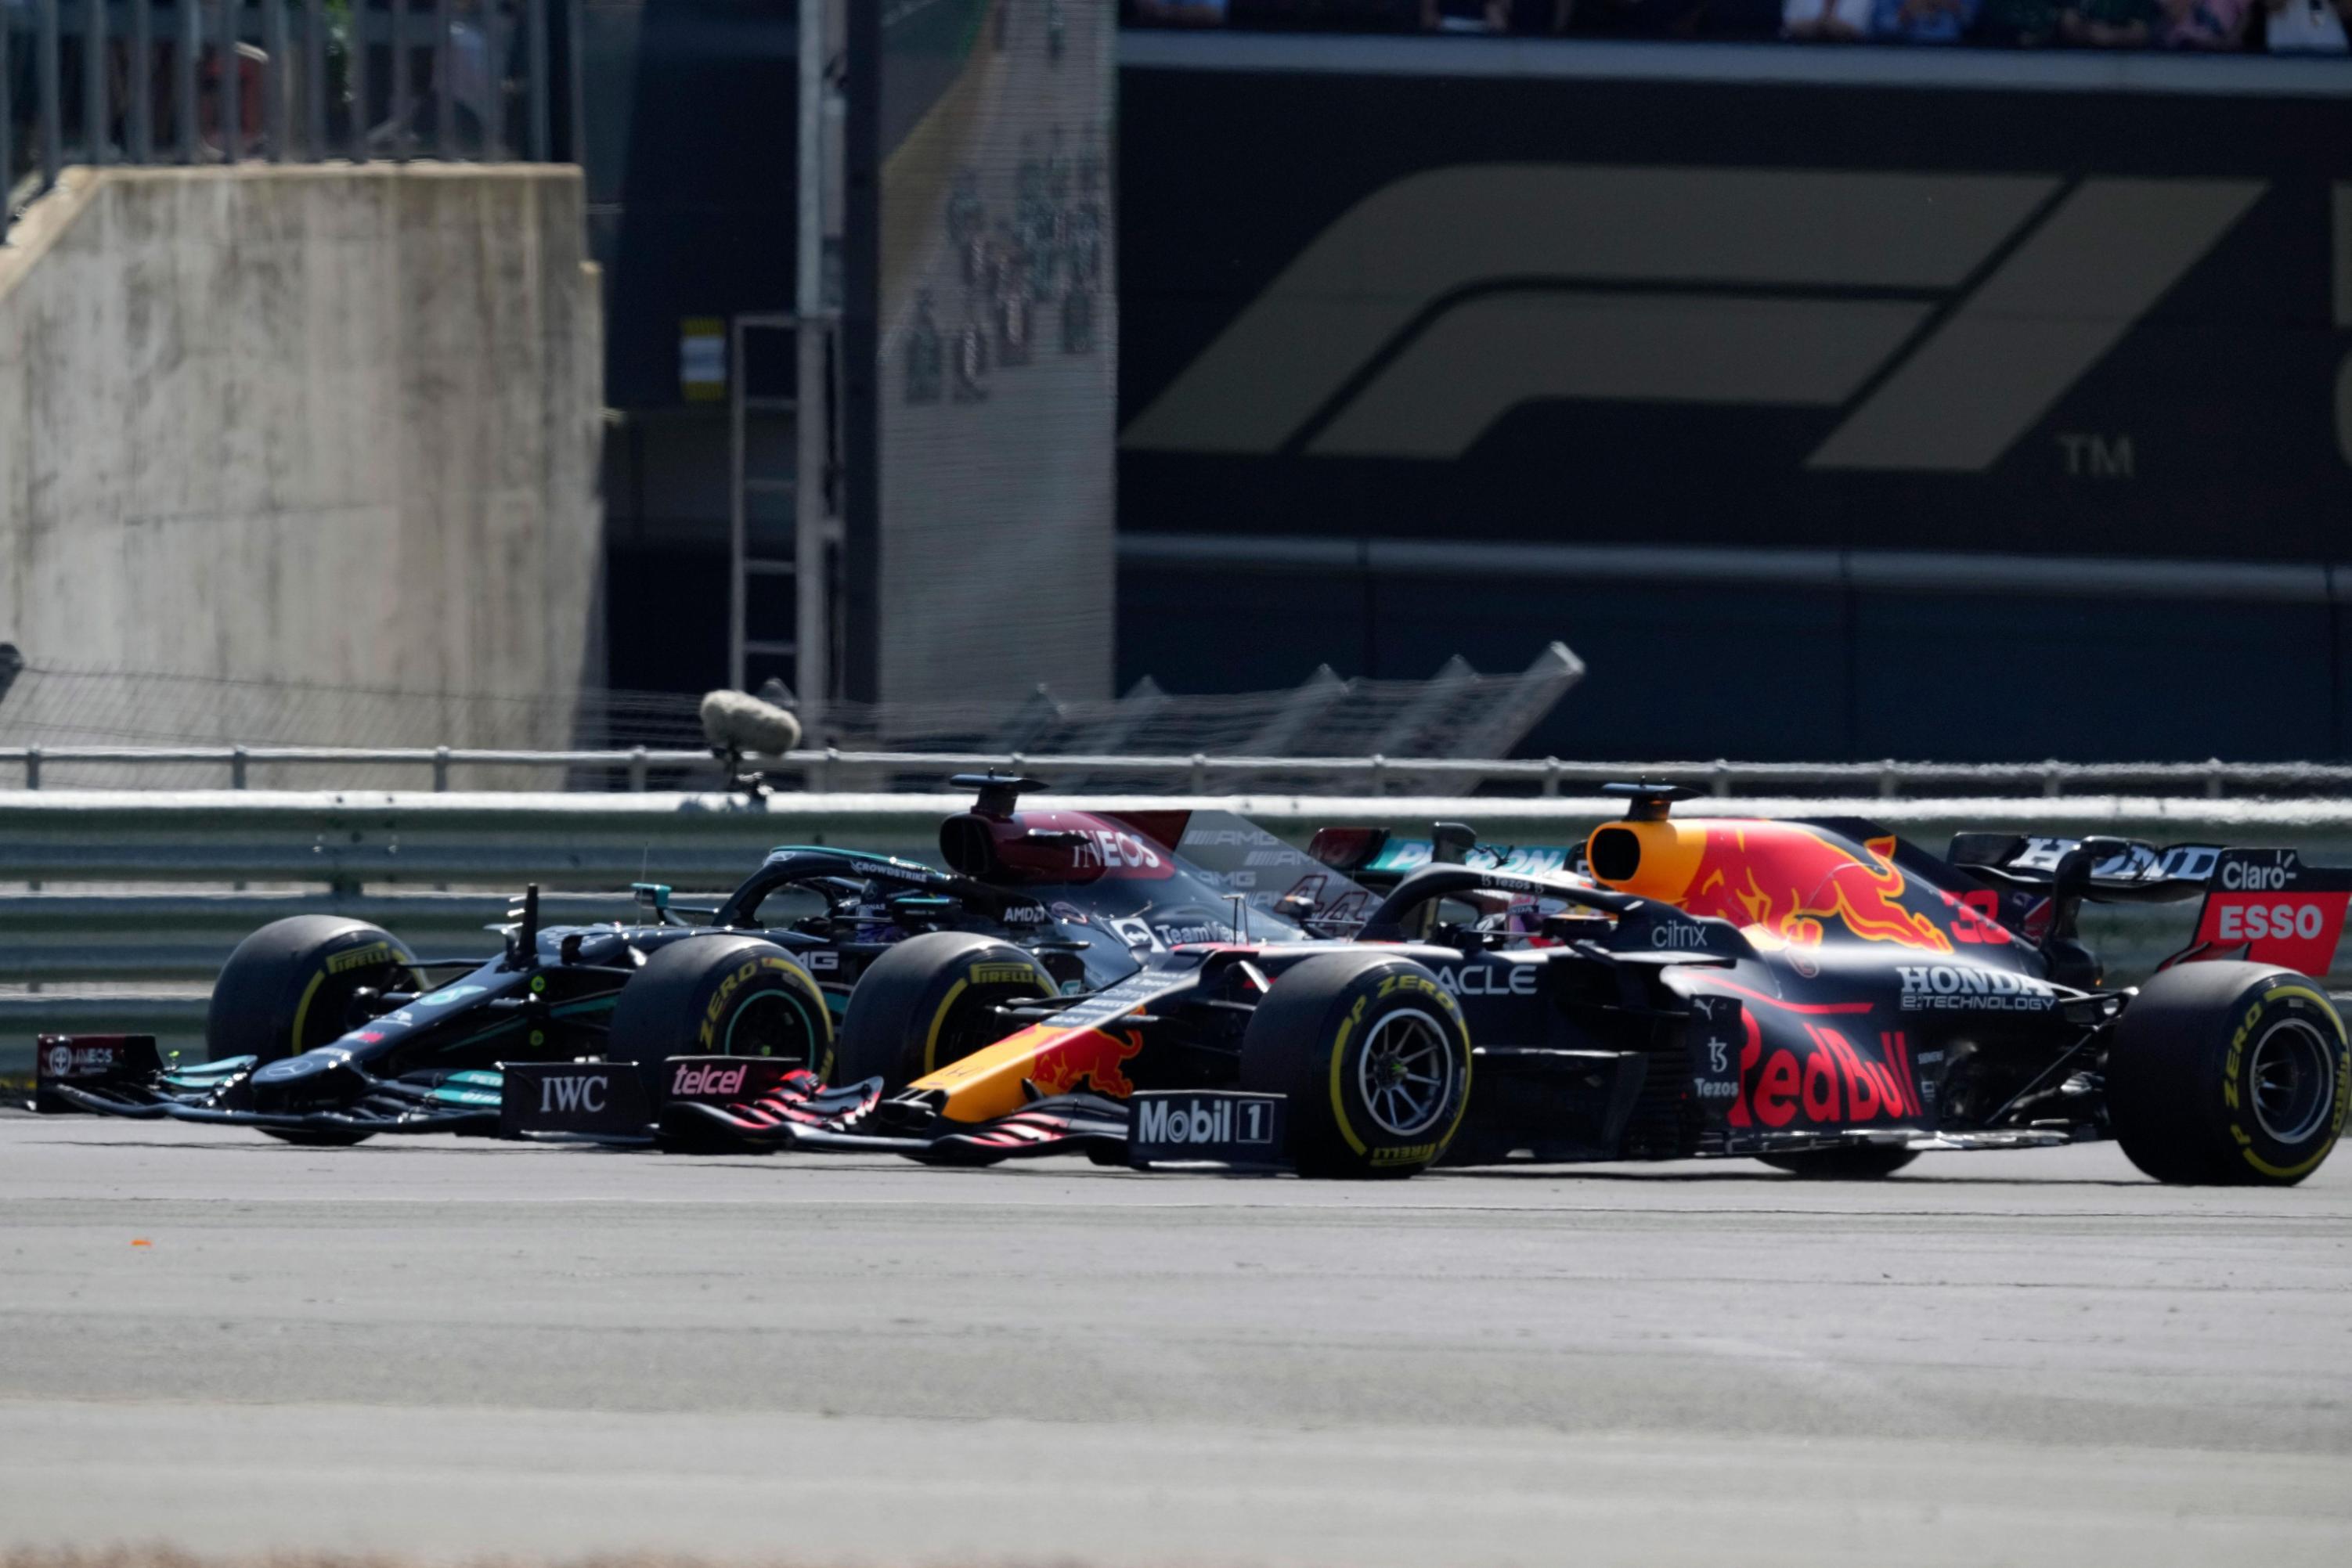 Lewis Hamilton wins British Grand Prix after high-speed collision with Max Verstappen